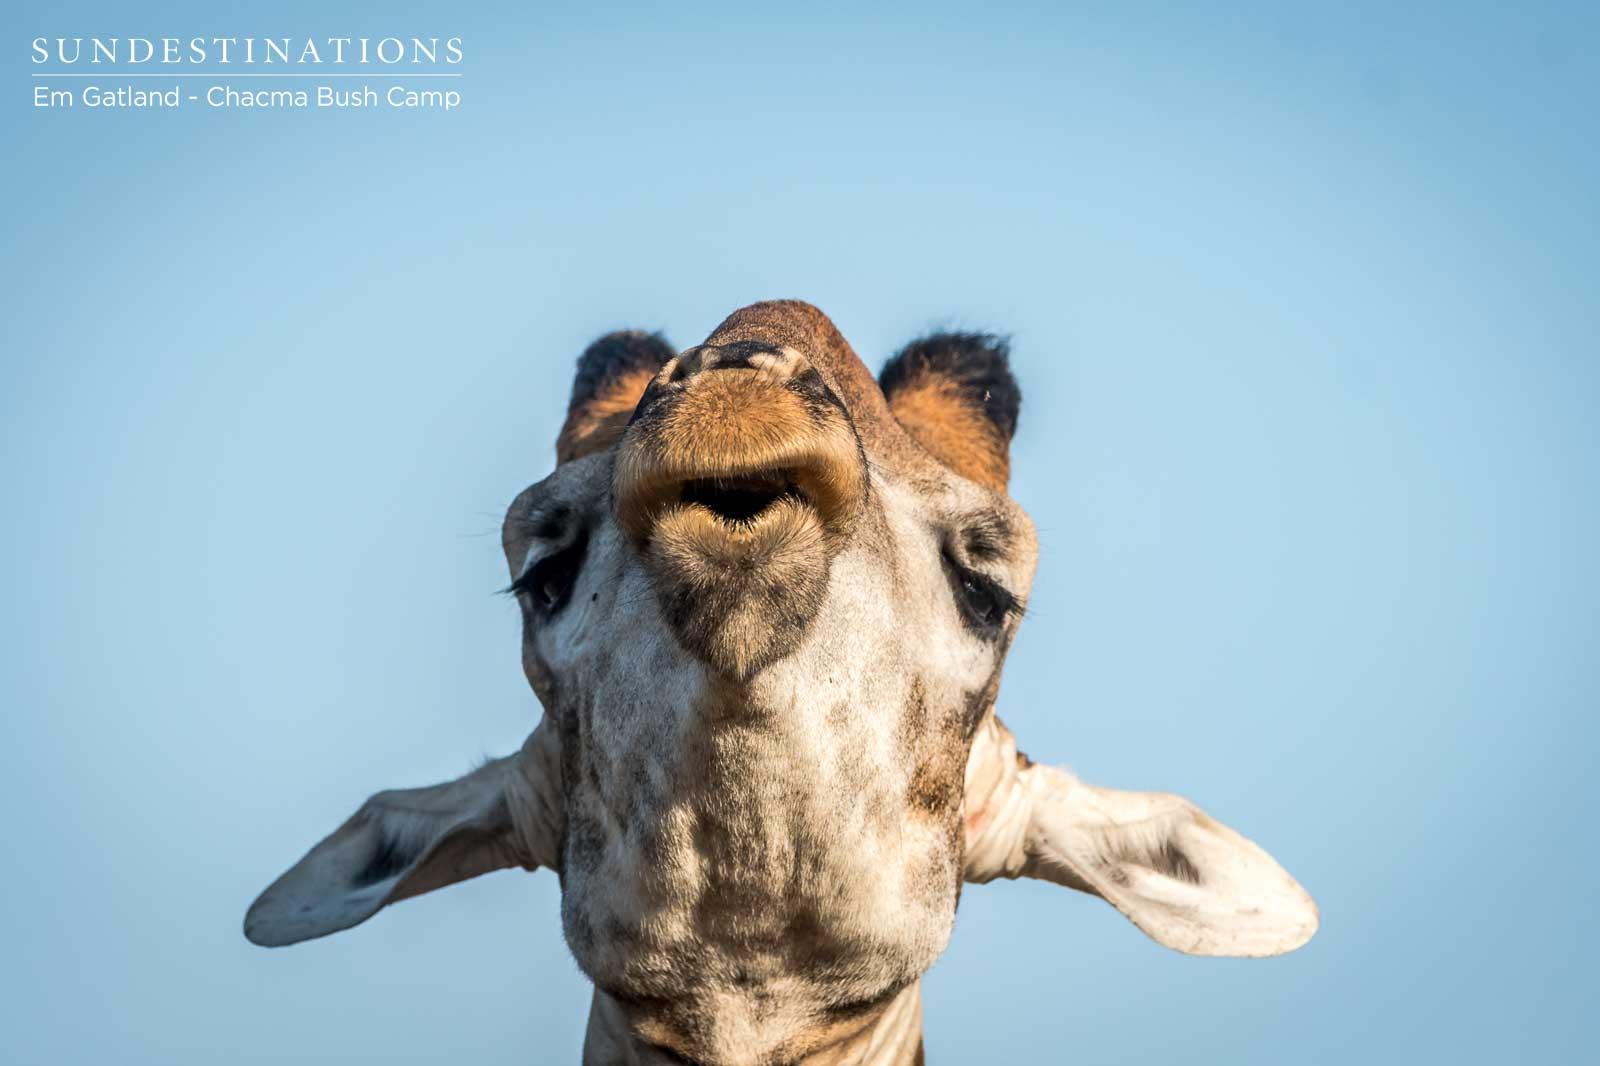 Giraffe Spotted at Chacma Bush Camp